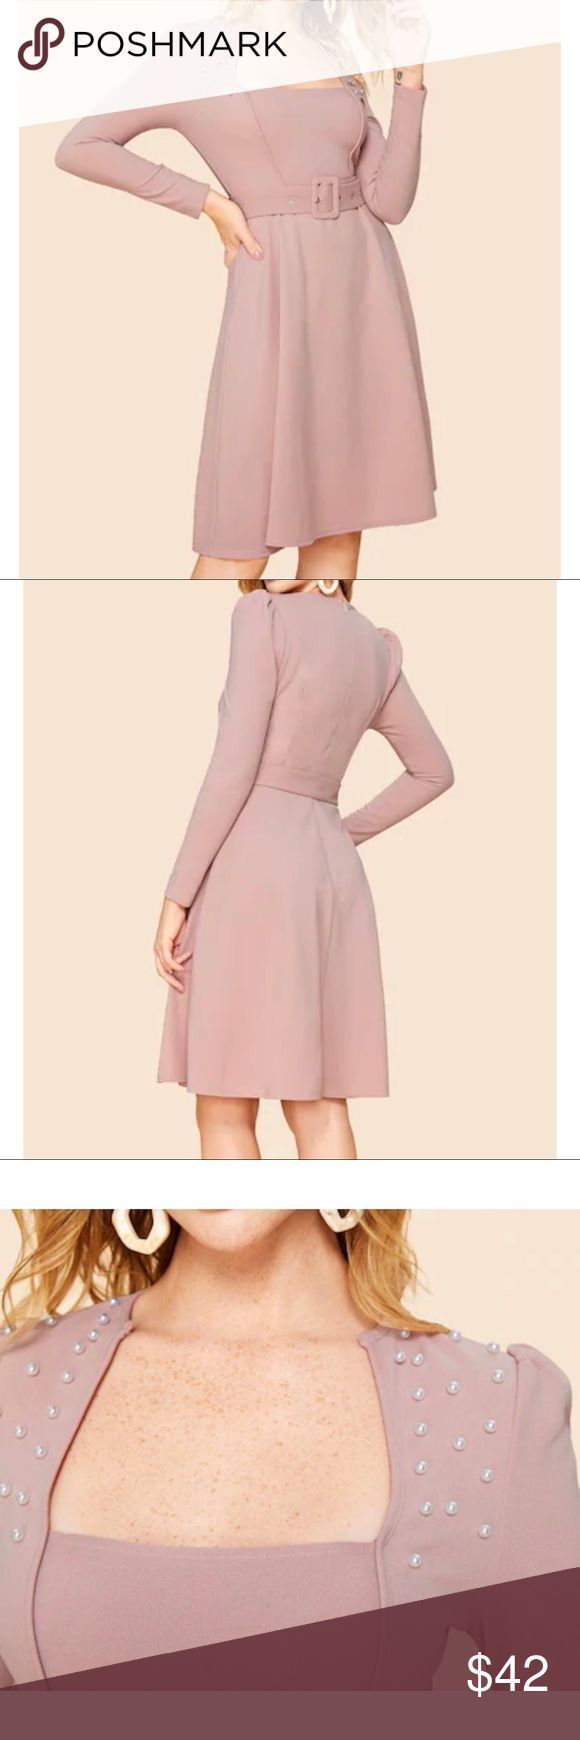 Belted Fit N Flare Beaded Dress Pale Pink NWT Vintage Look Dress Pale Pink  G/00…